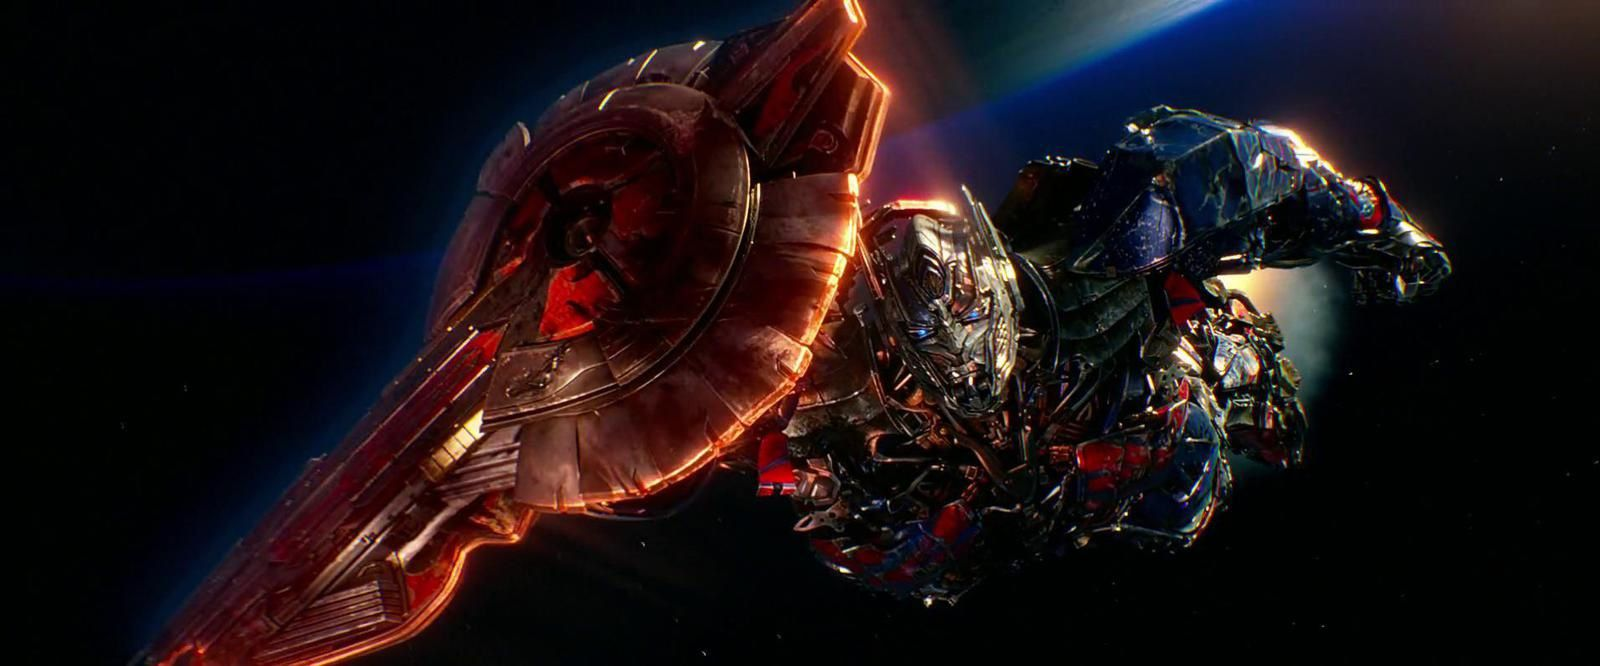 Mark Wahlberg sera bel et bien de retour dans Transformers 5